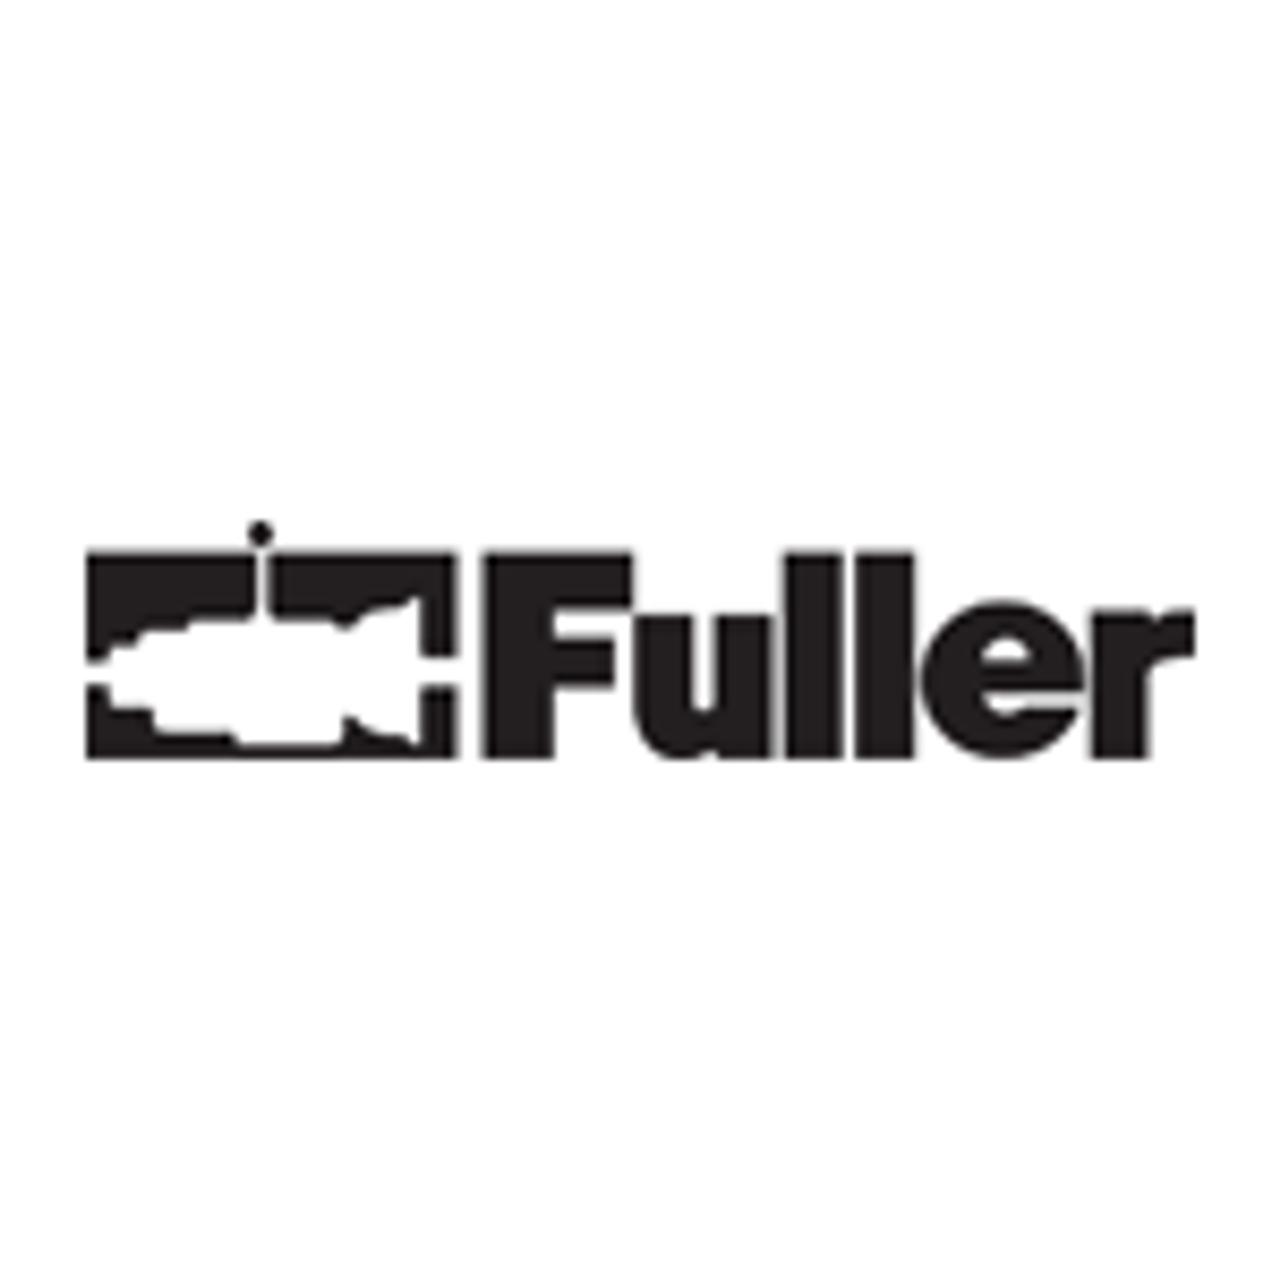 K3681 Eaton Fuller Transmission Wiring Harness